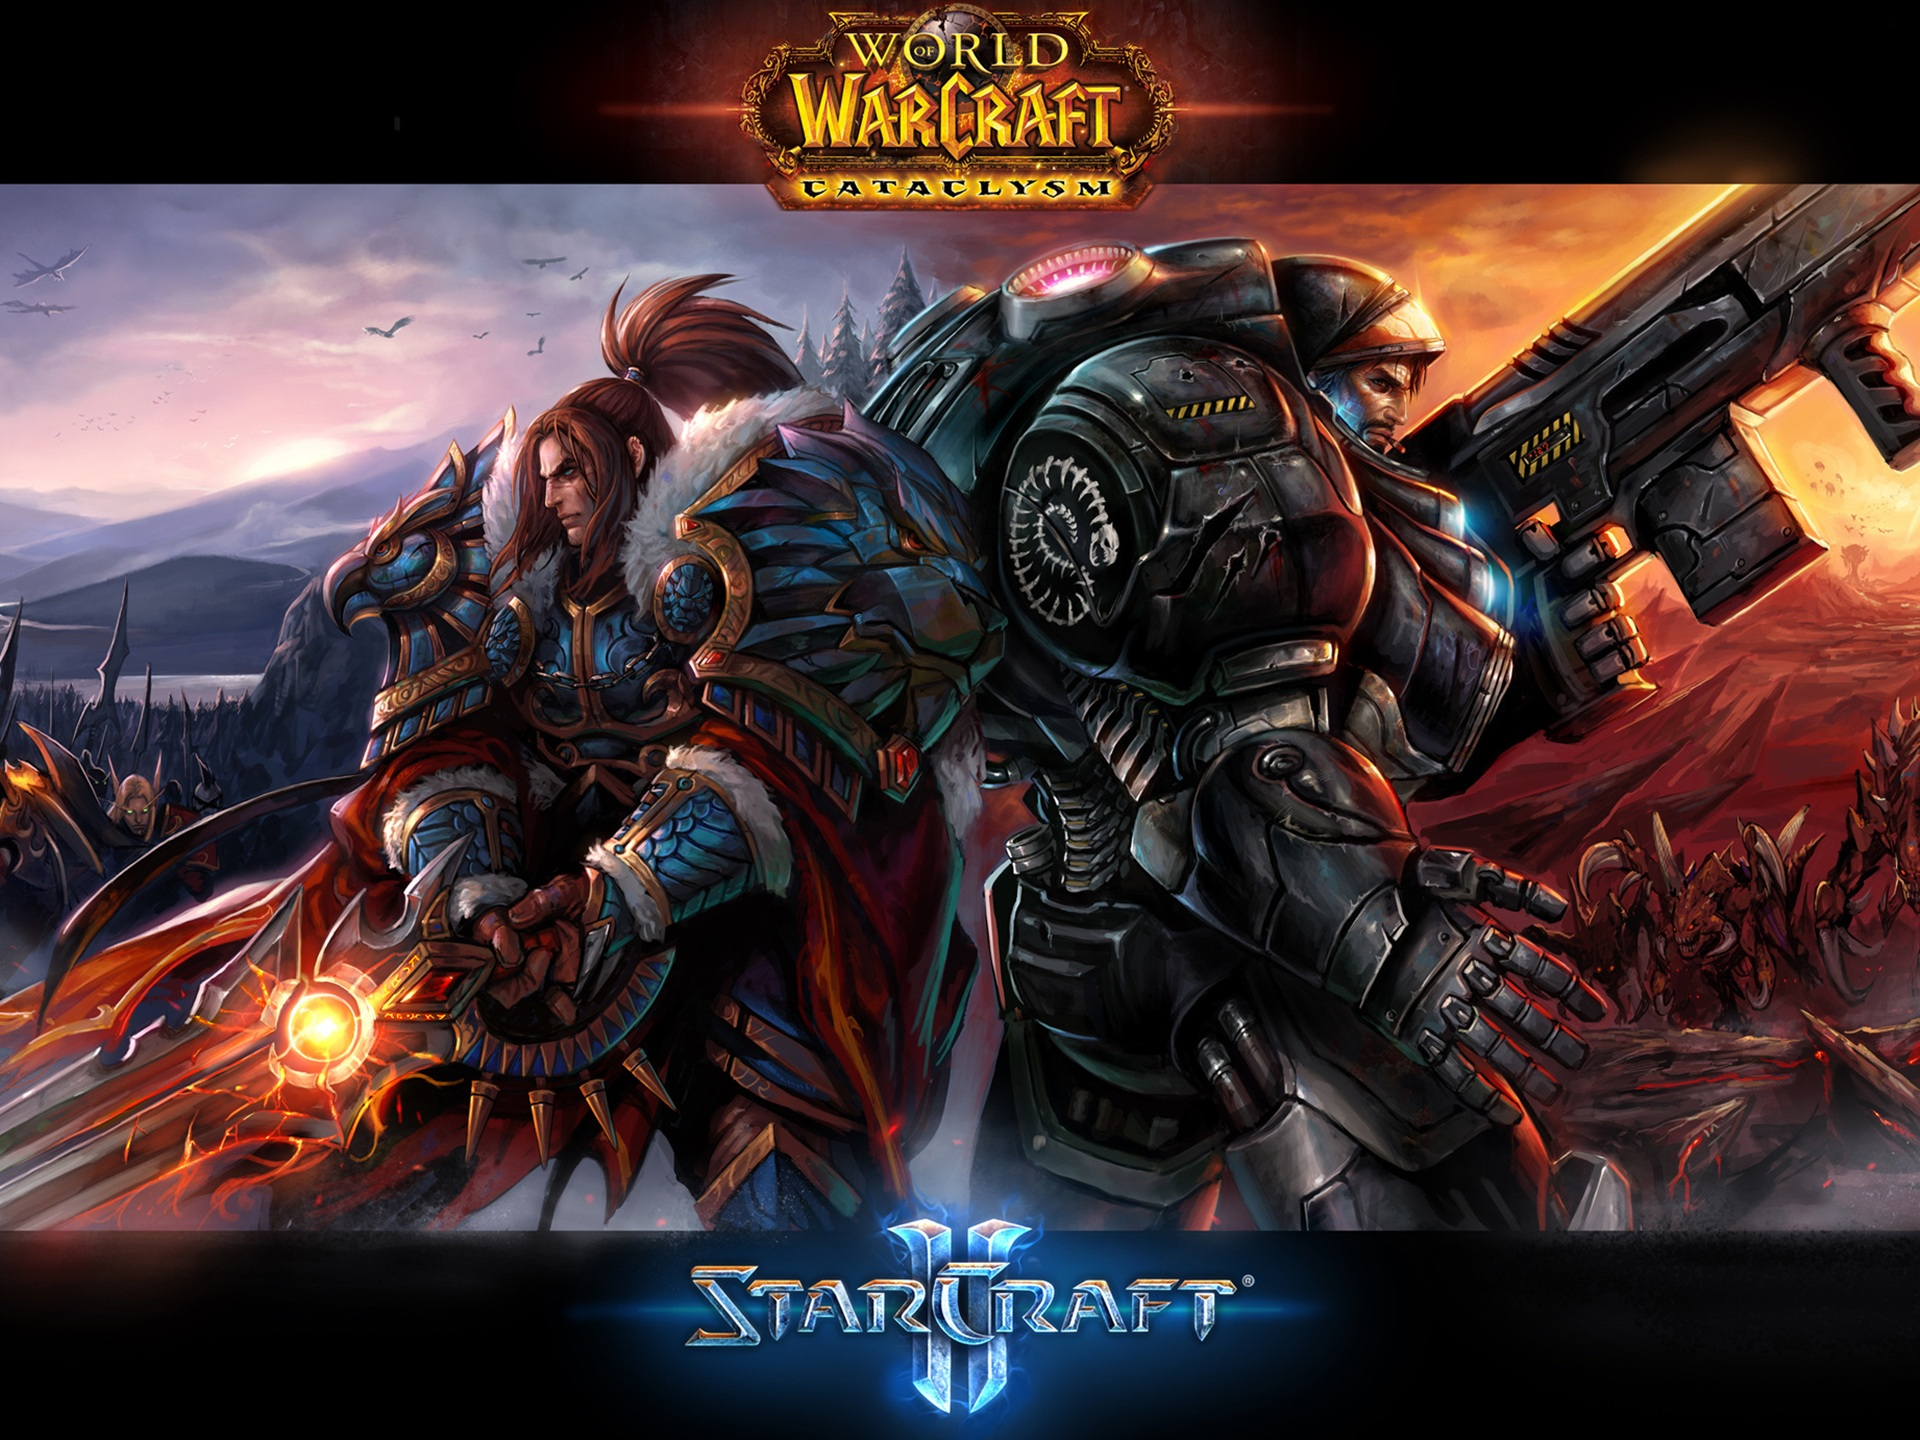 Warcraft starcraft 2 full hd wallpaper and background - Starcraft 2 wallpaper art ...